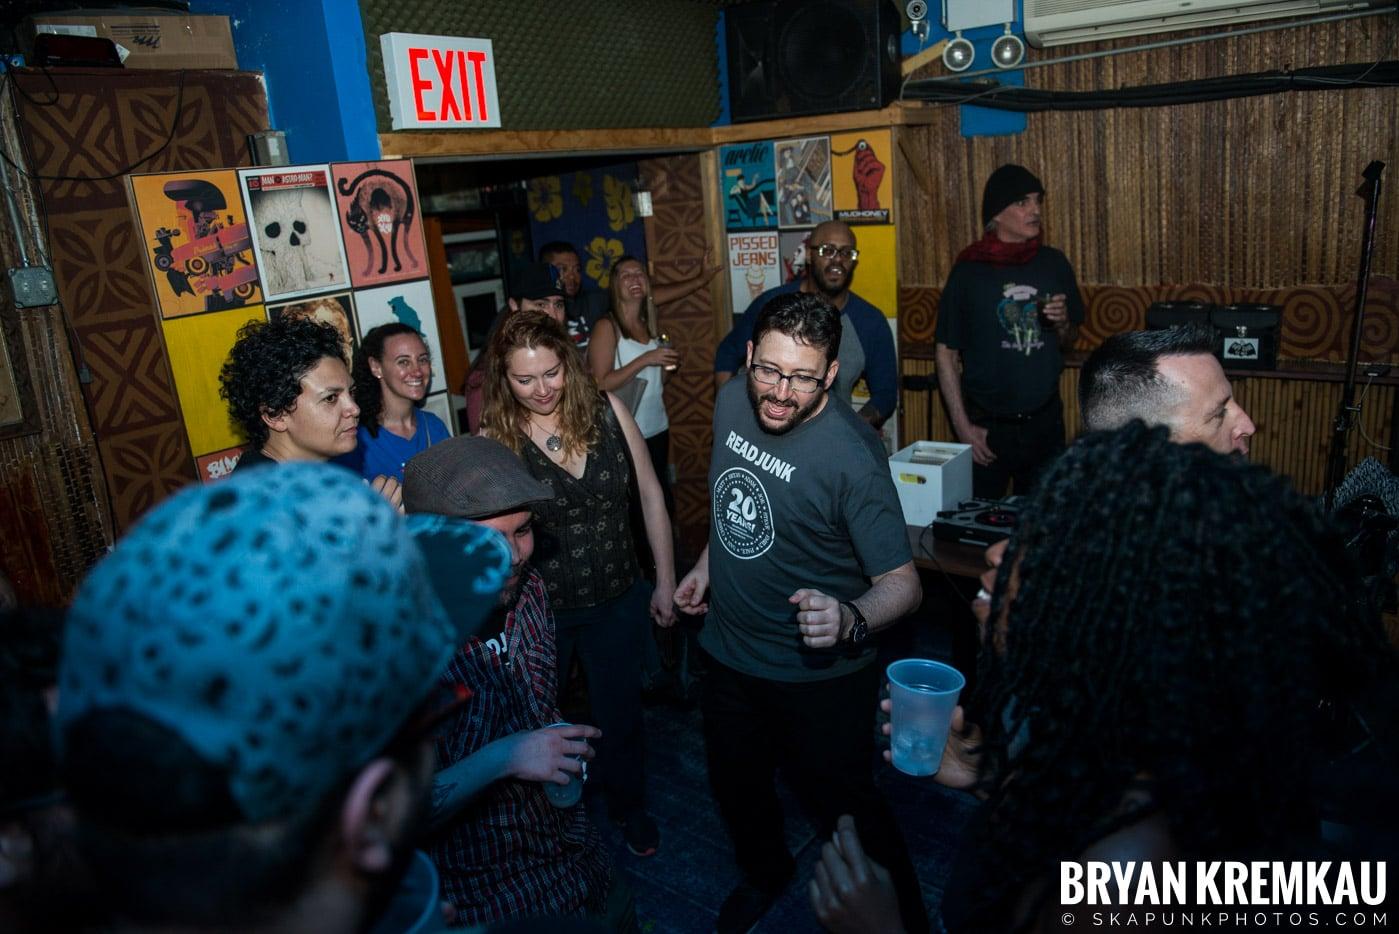 ReadJunk.com 20th Anniversary Party @ Otto's Shrunken Head, NYC - 4.29.17 (17)